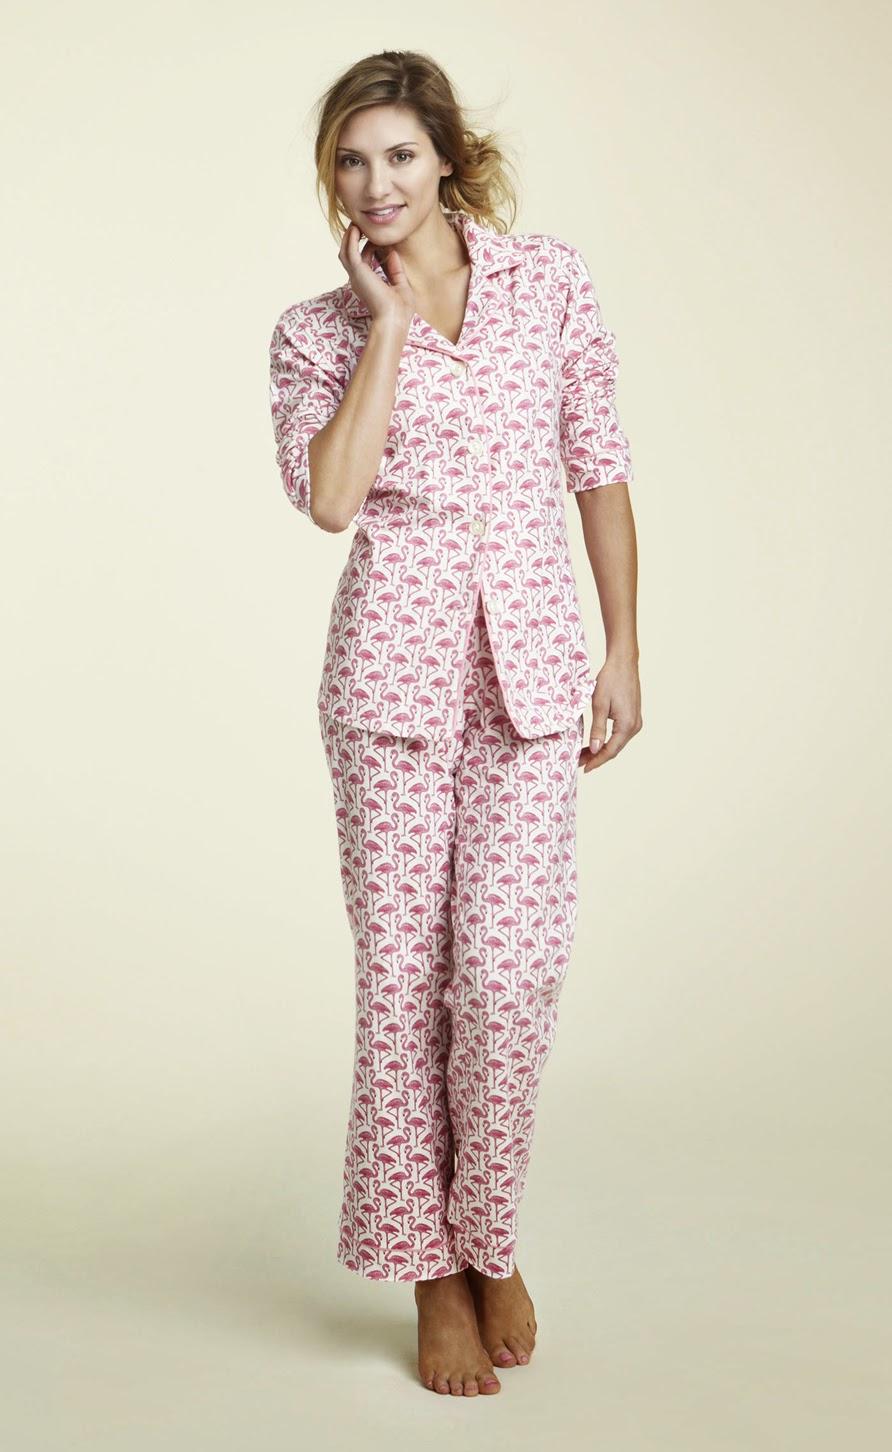 products set com comforter raglan two comfortable sleeve pajamas fashionmia pajama pieces